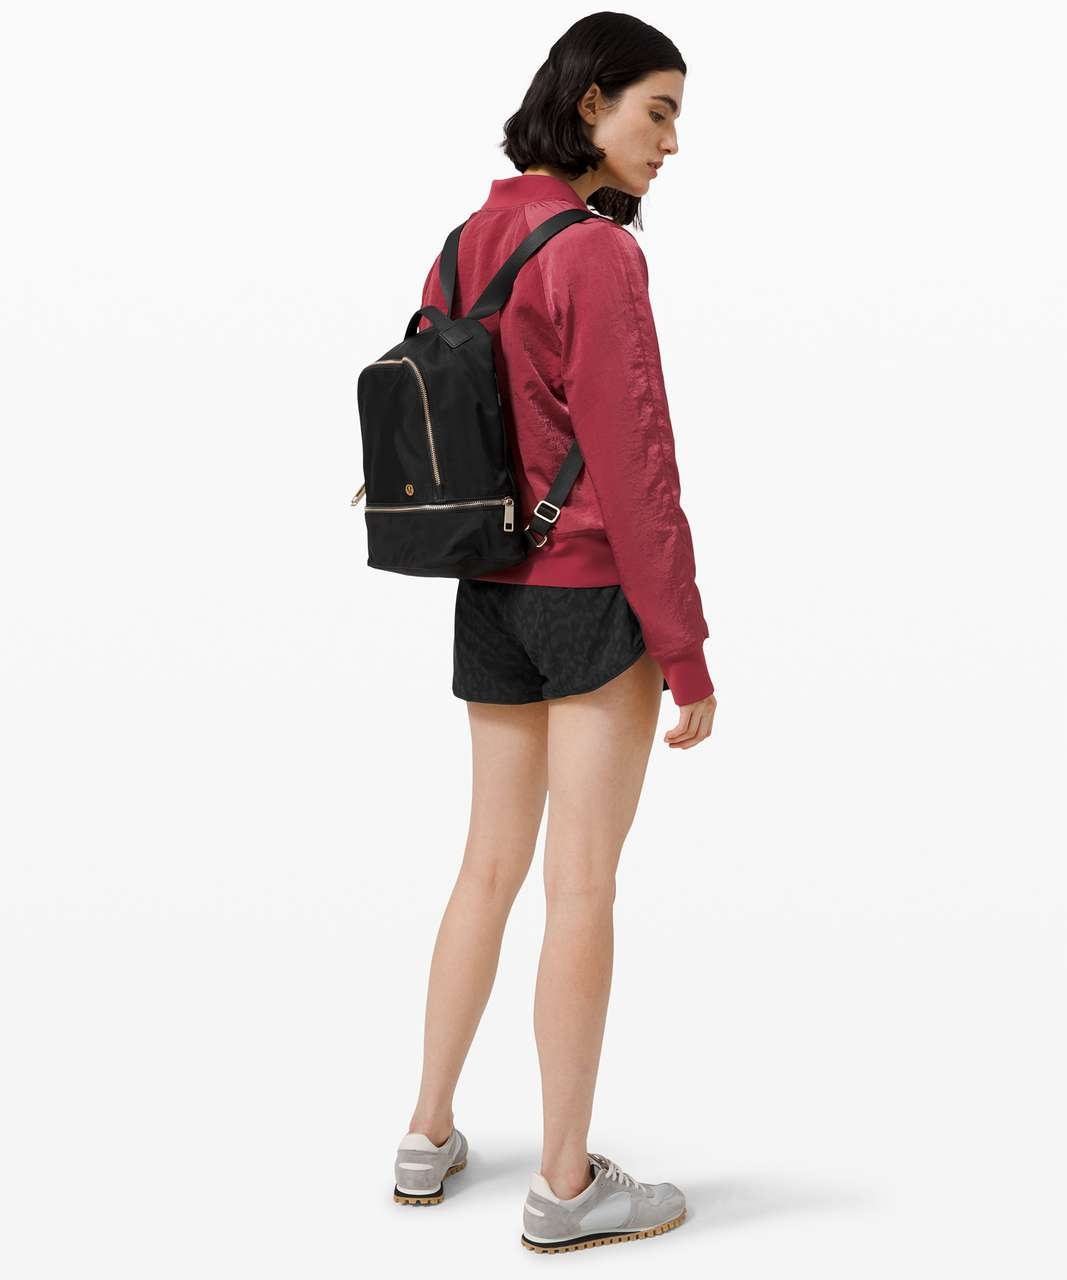 Lululemon City Adventurer Backpack Mini *10L - Black / Gold